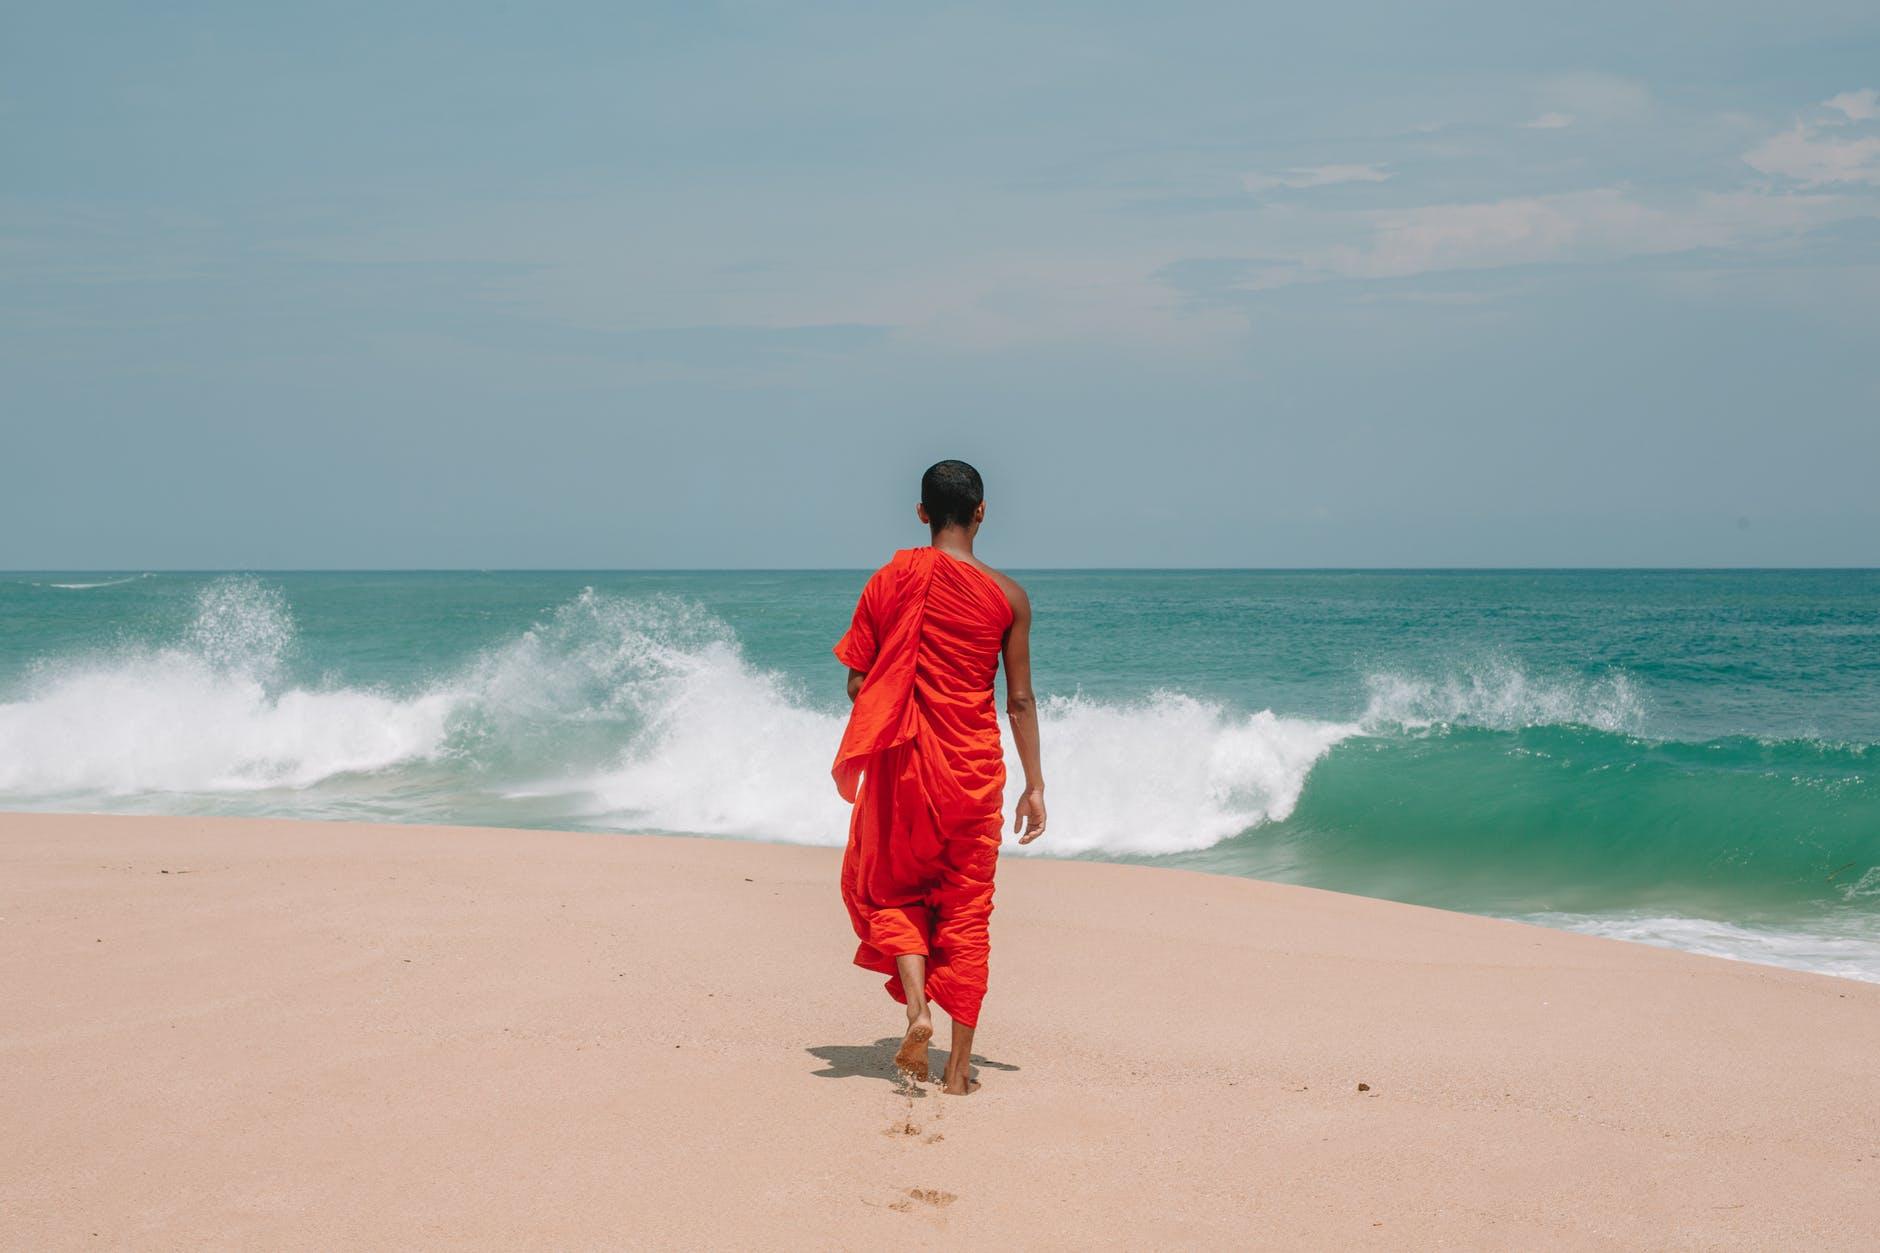 unrecognizable young ethnic man walking on seashore